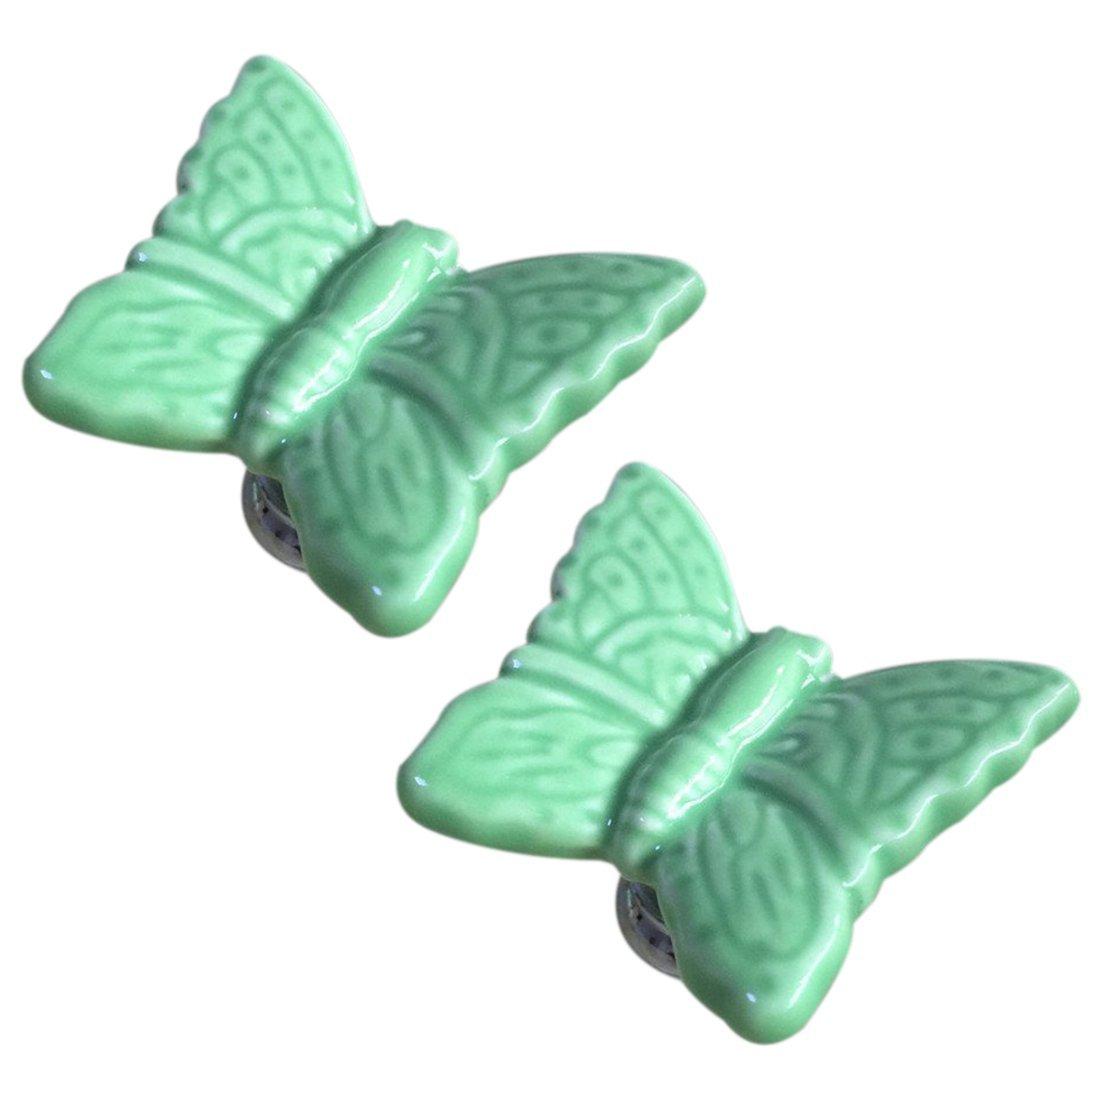 Drawer Knobs - SODIAL(R) 10Pcs Butterfly Knobs Ceramic Drawer Handles Pulls for Kids Girls Kitchen Furniture Door Cabinet Dresser Closet Wardrobe Cupboard Vanities with Screws (Green)